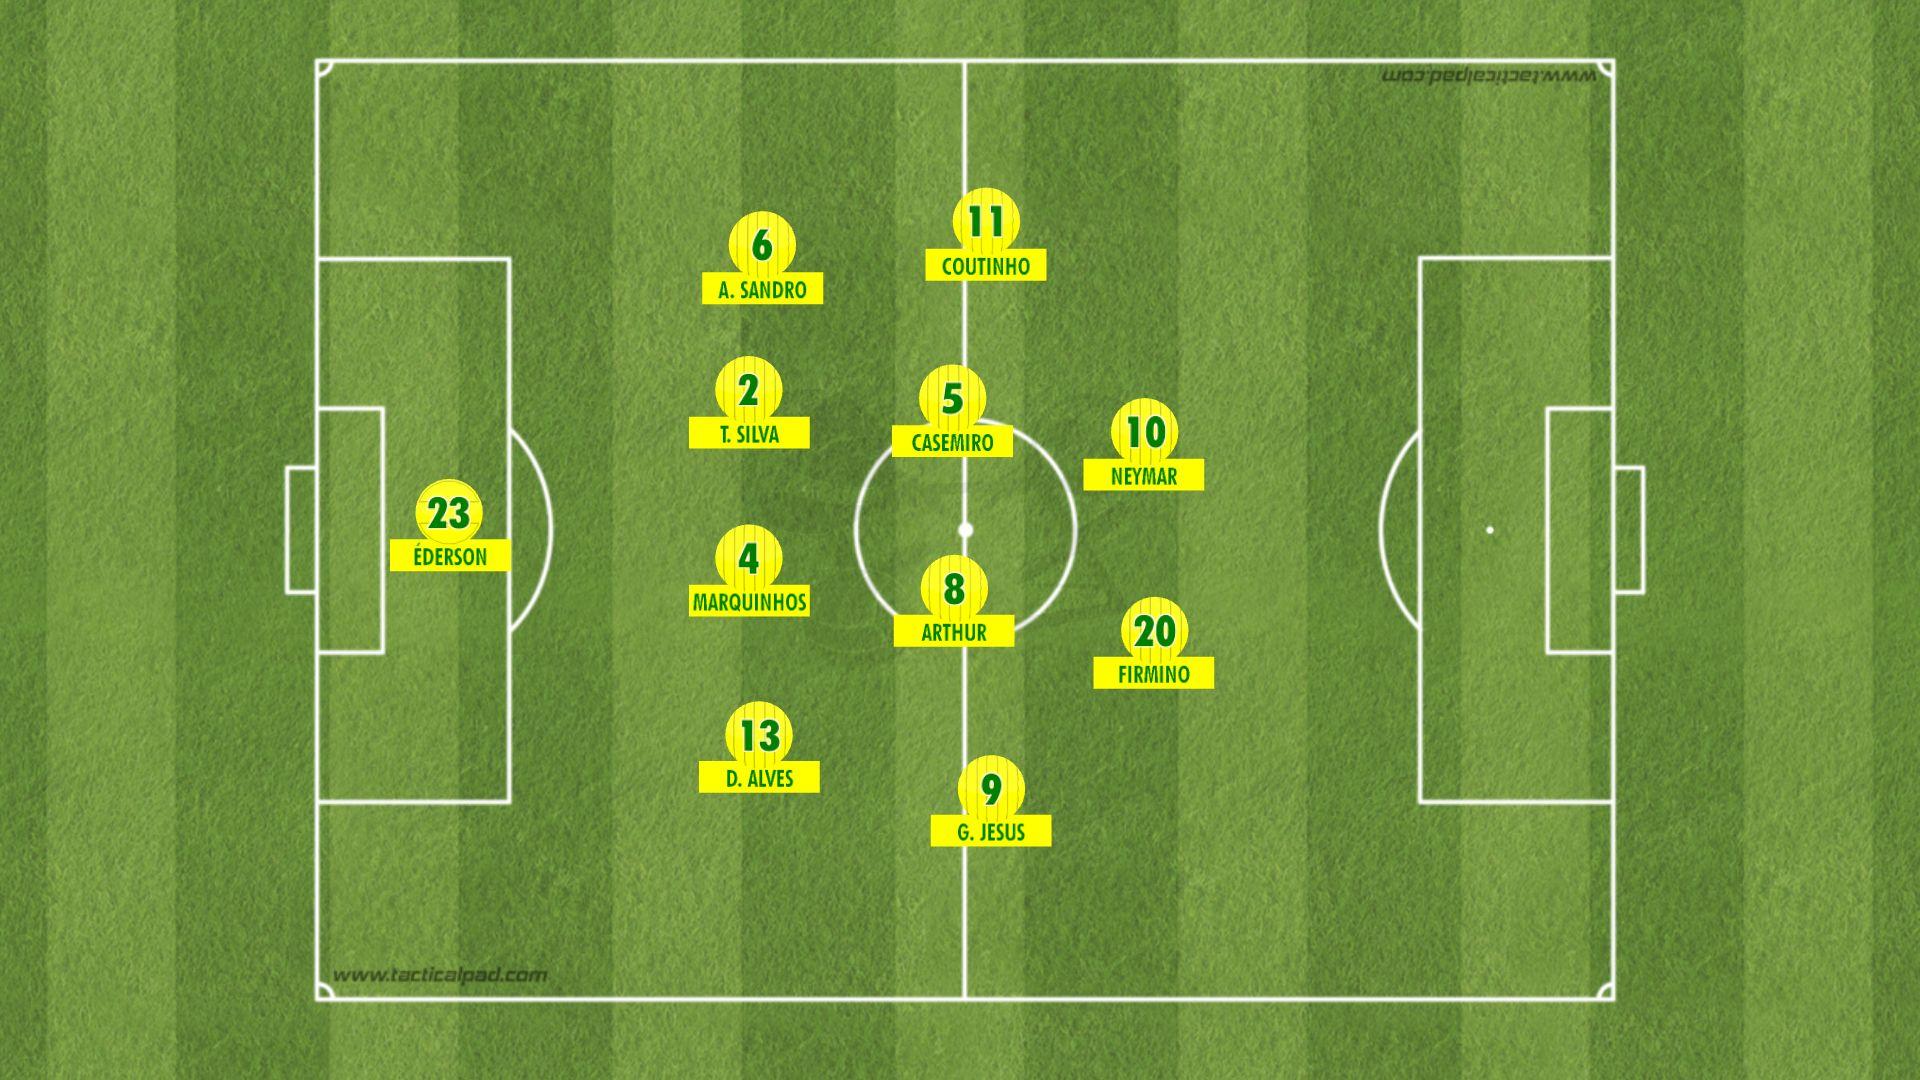 Brasil Joga Futebol Humilde E Completa Tres Jogos Sem Vitoria